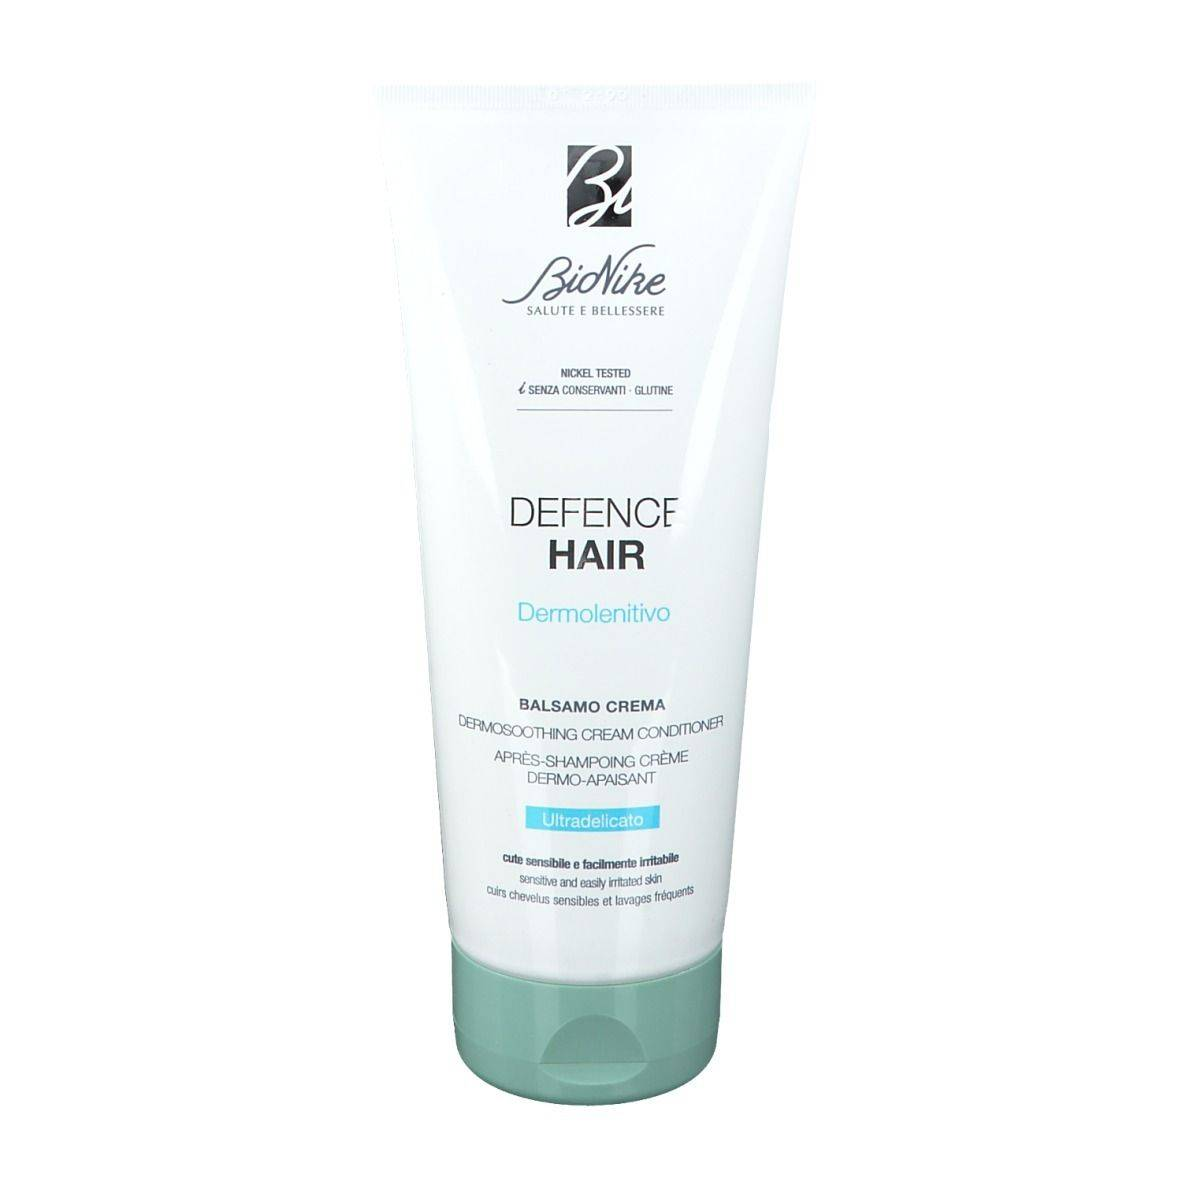 BioNike DEFENCE HAIR Après-Shampoing crème Dermo-apaisant ultra-doux ml shampooing